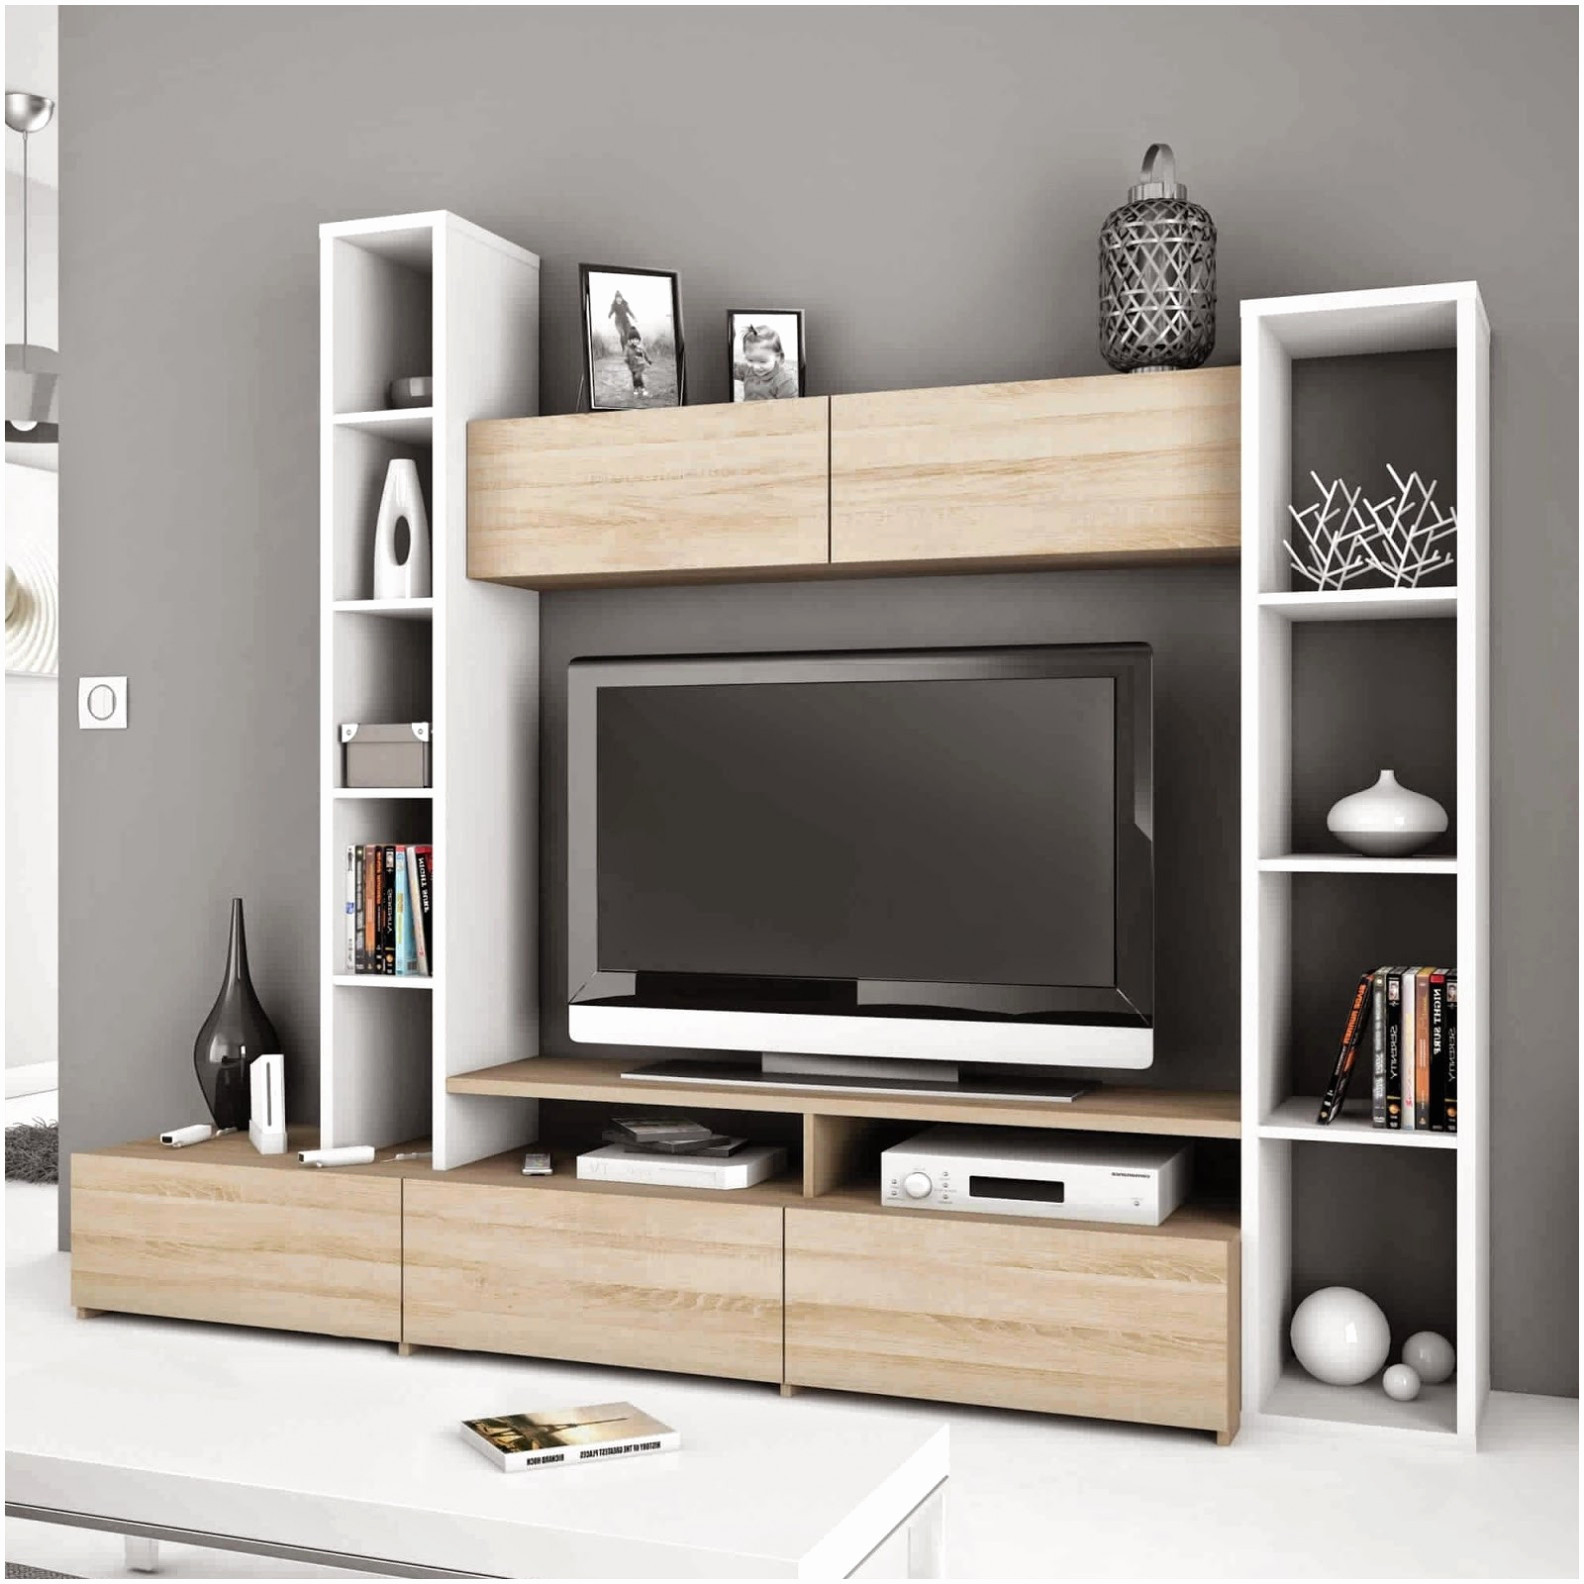 Hauteur d'un meuble tv suspendu